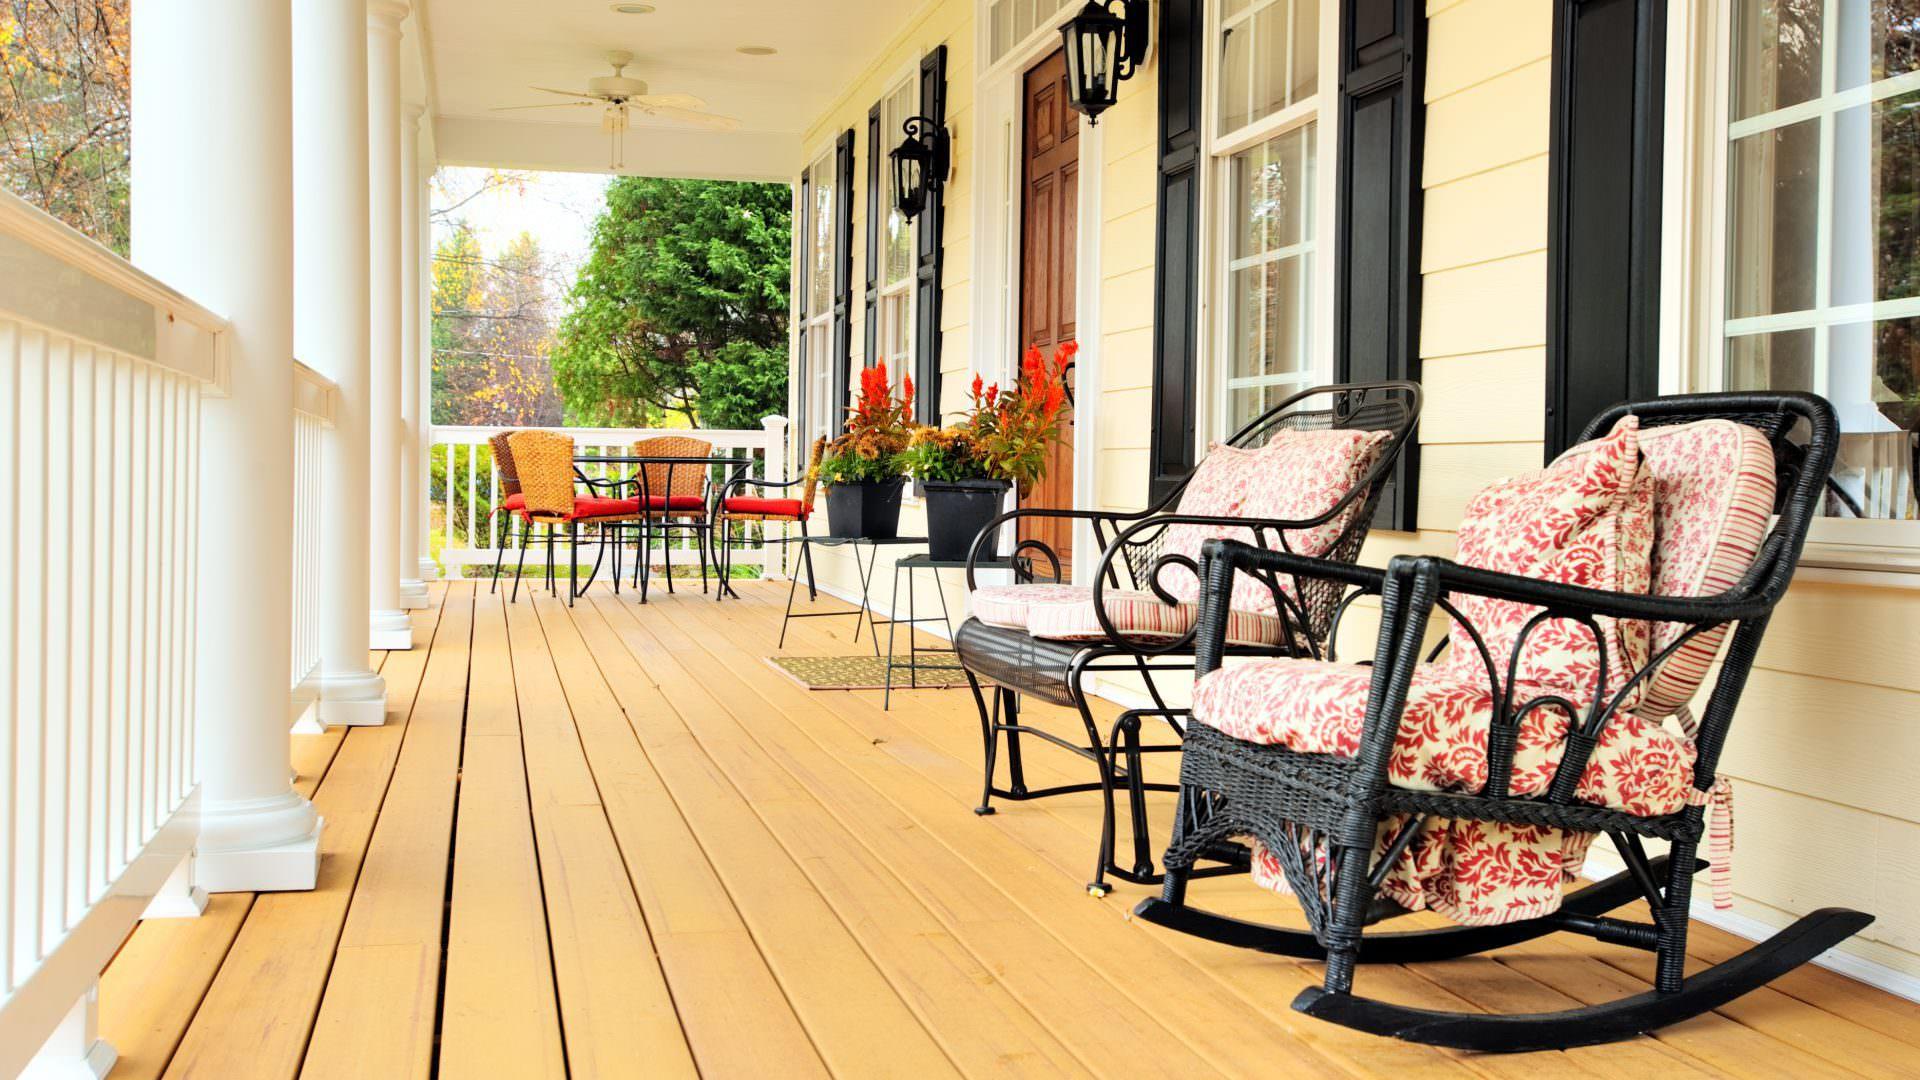 Jacksonville FL Real Estate and Homes